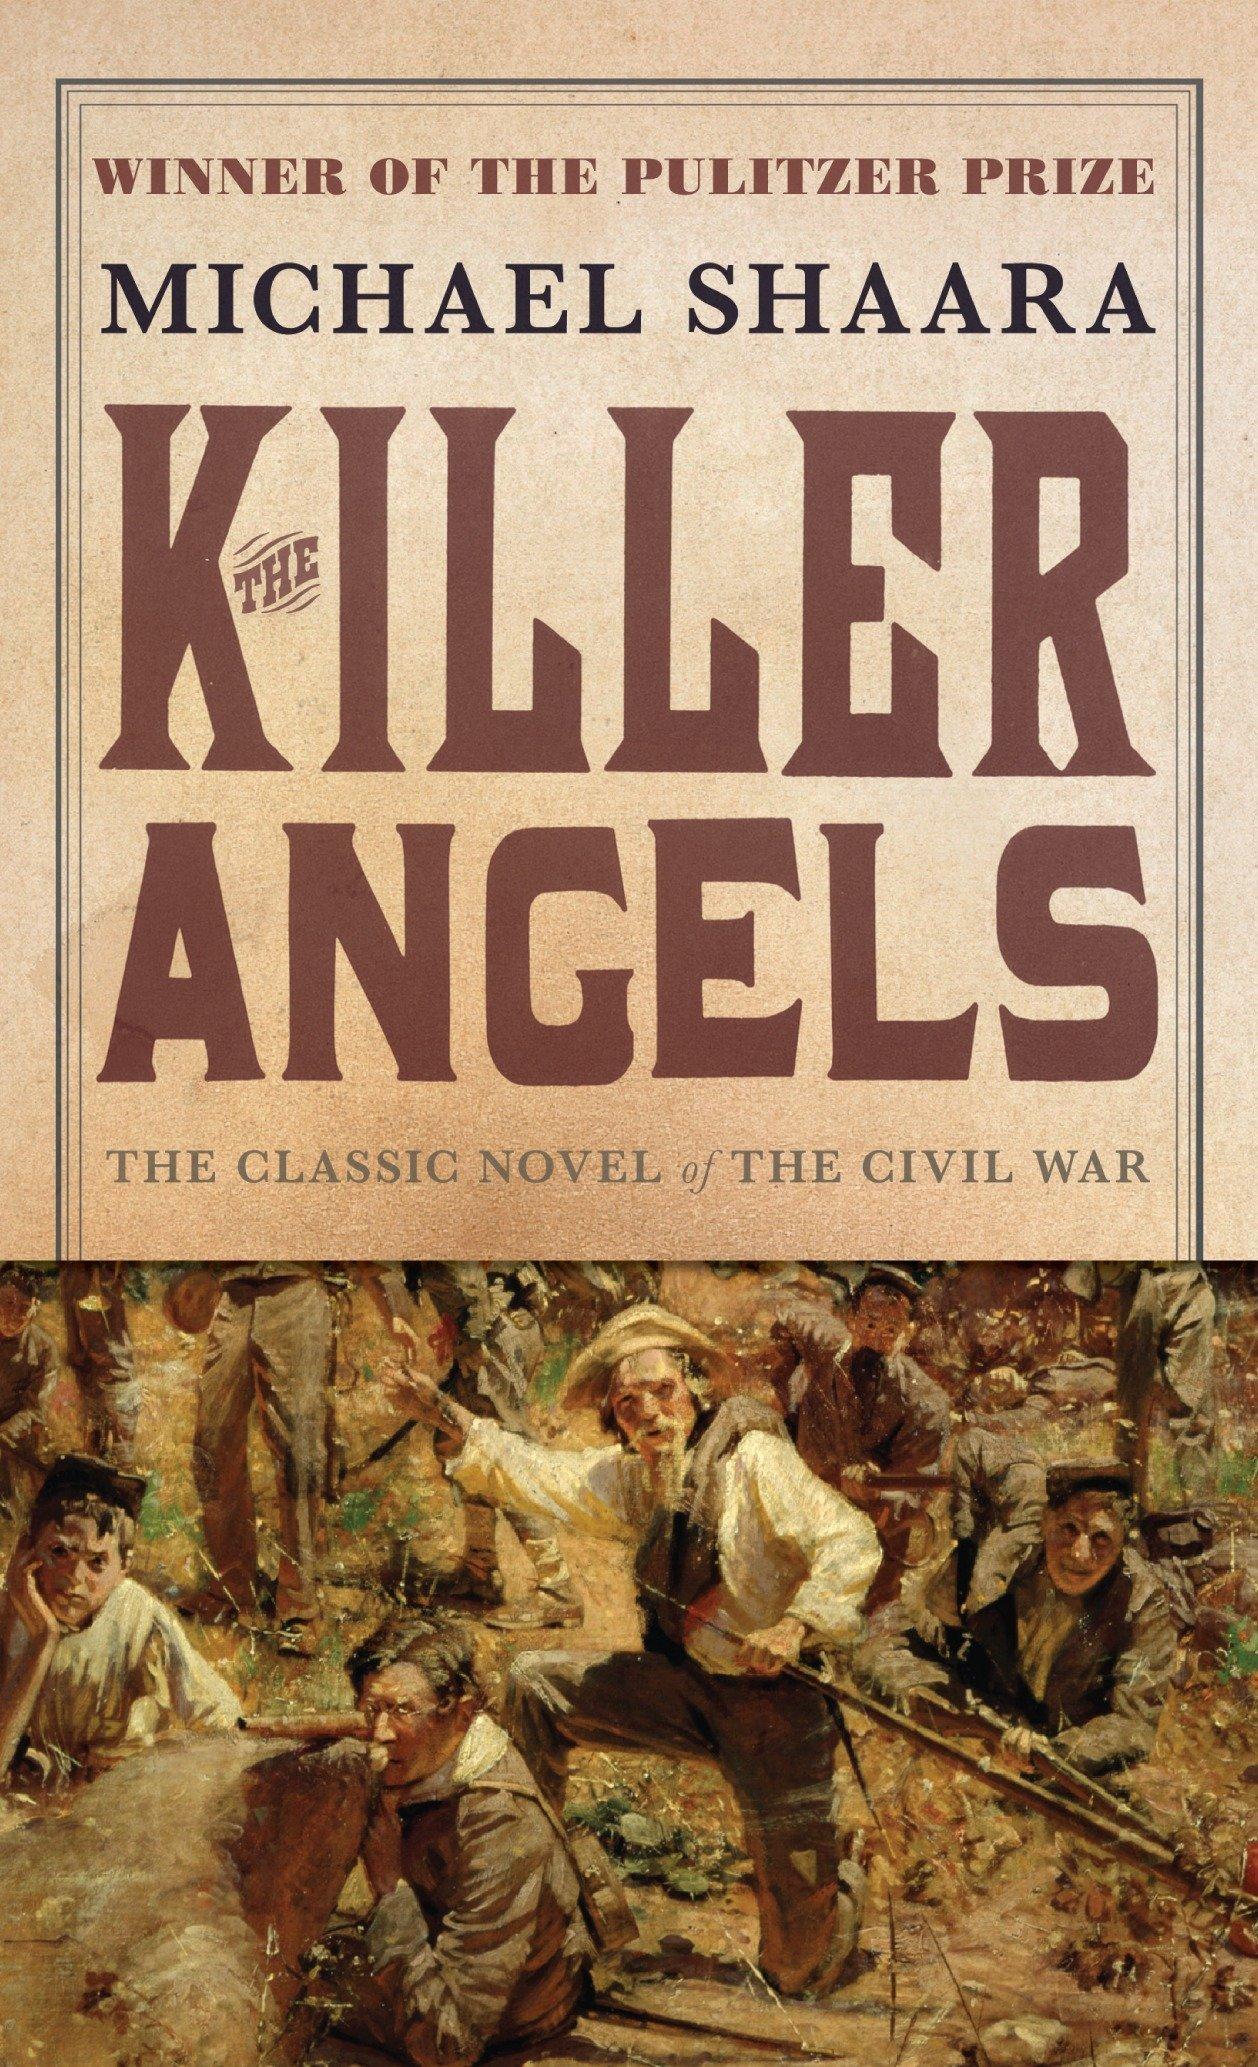 Amazon.com: The Killer Angels: The Classic Novel of the Civil War (Civil  War Trilogy) (9780345348104): Michael Shaara: Books